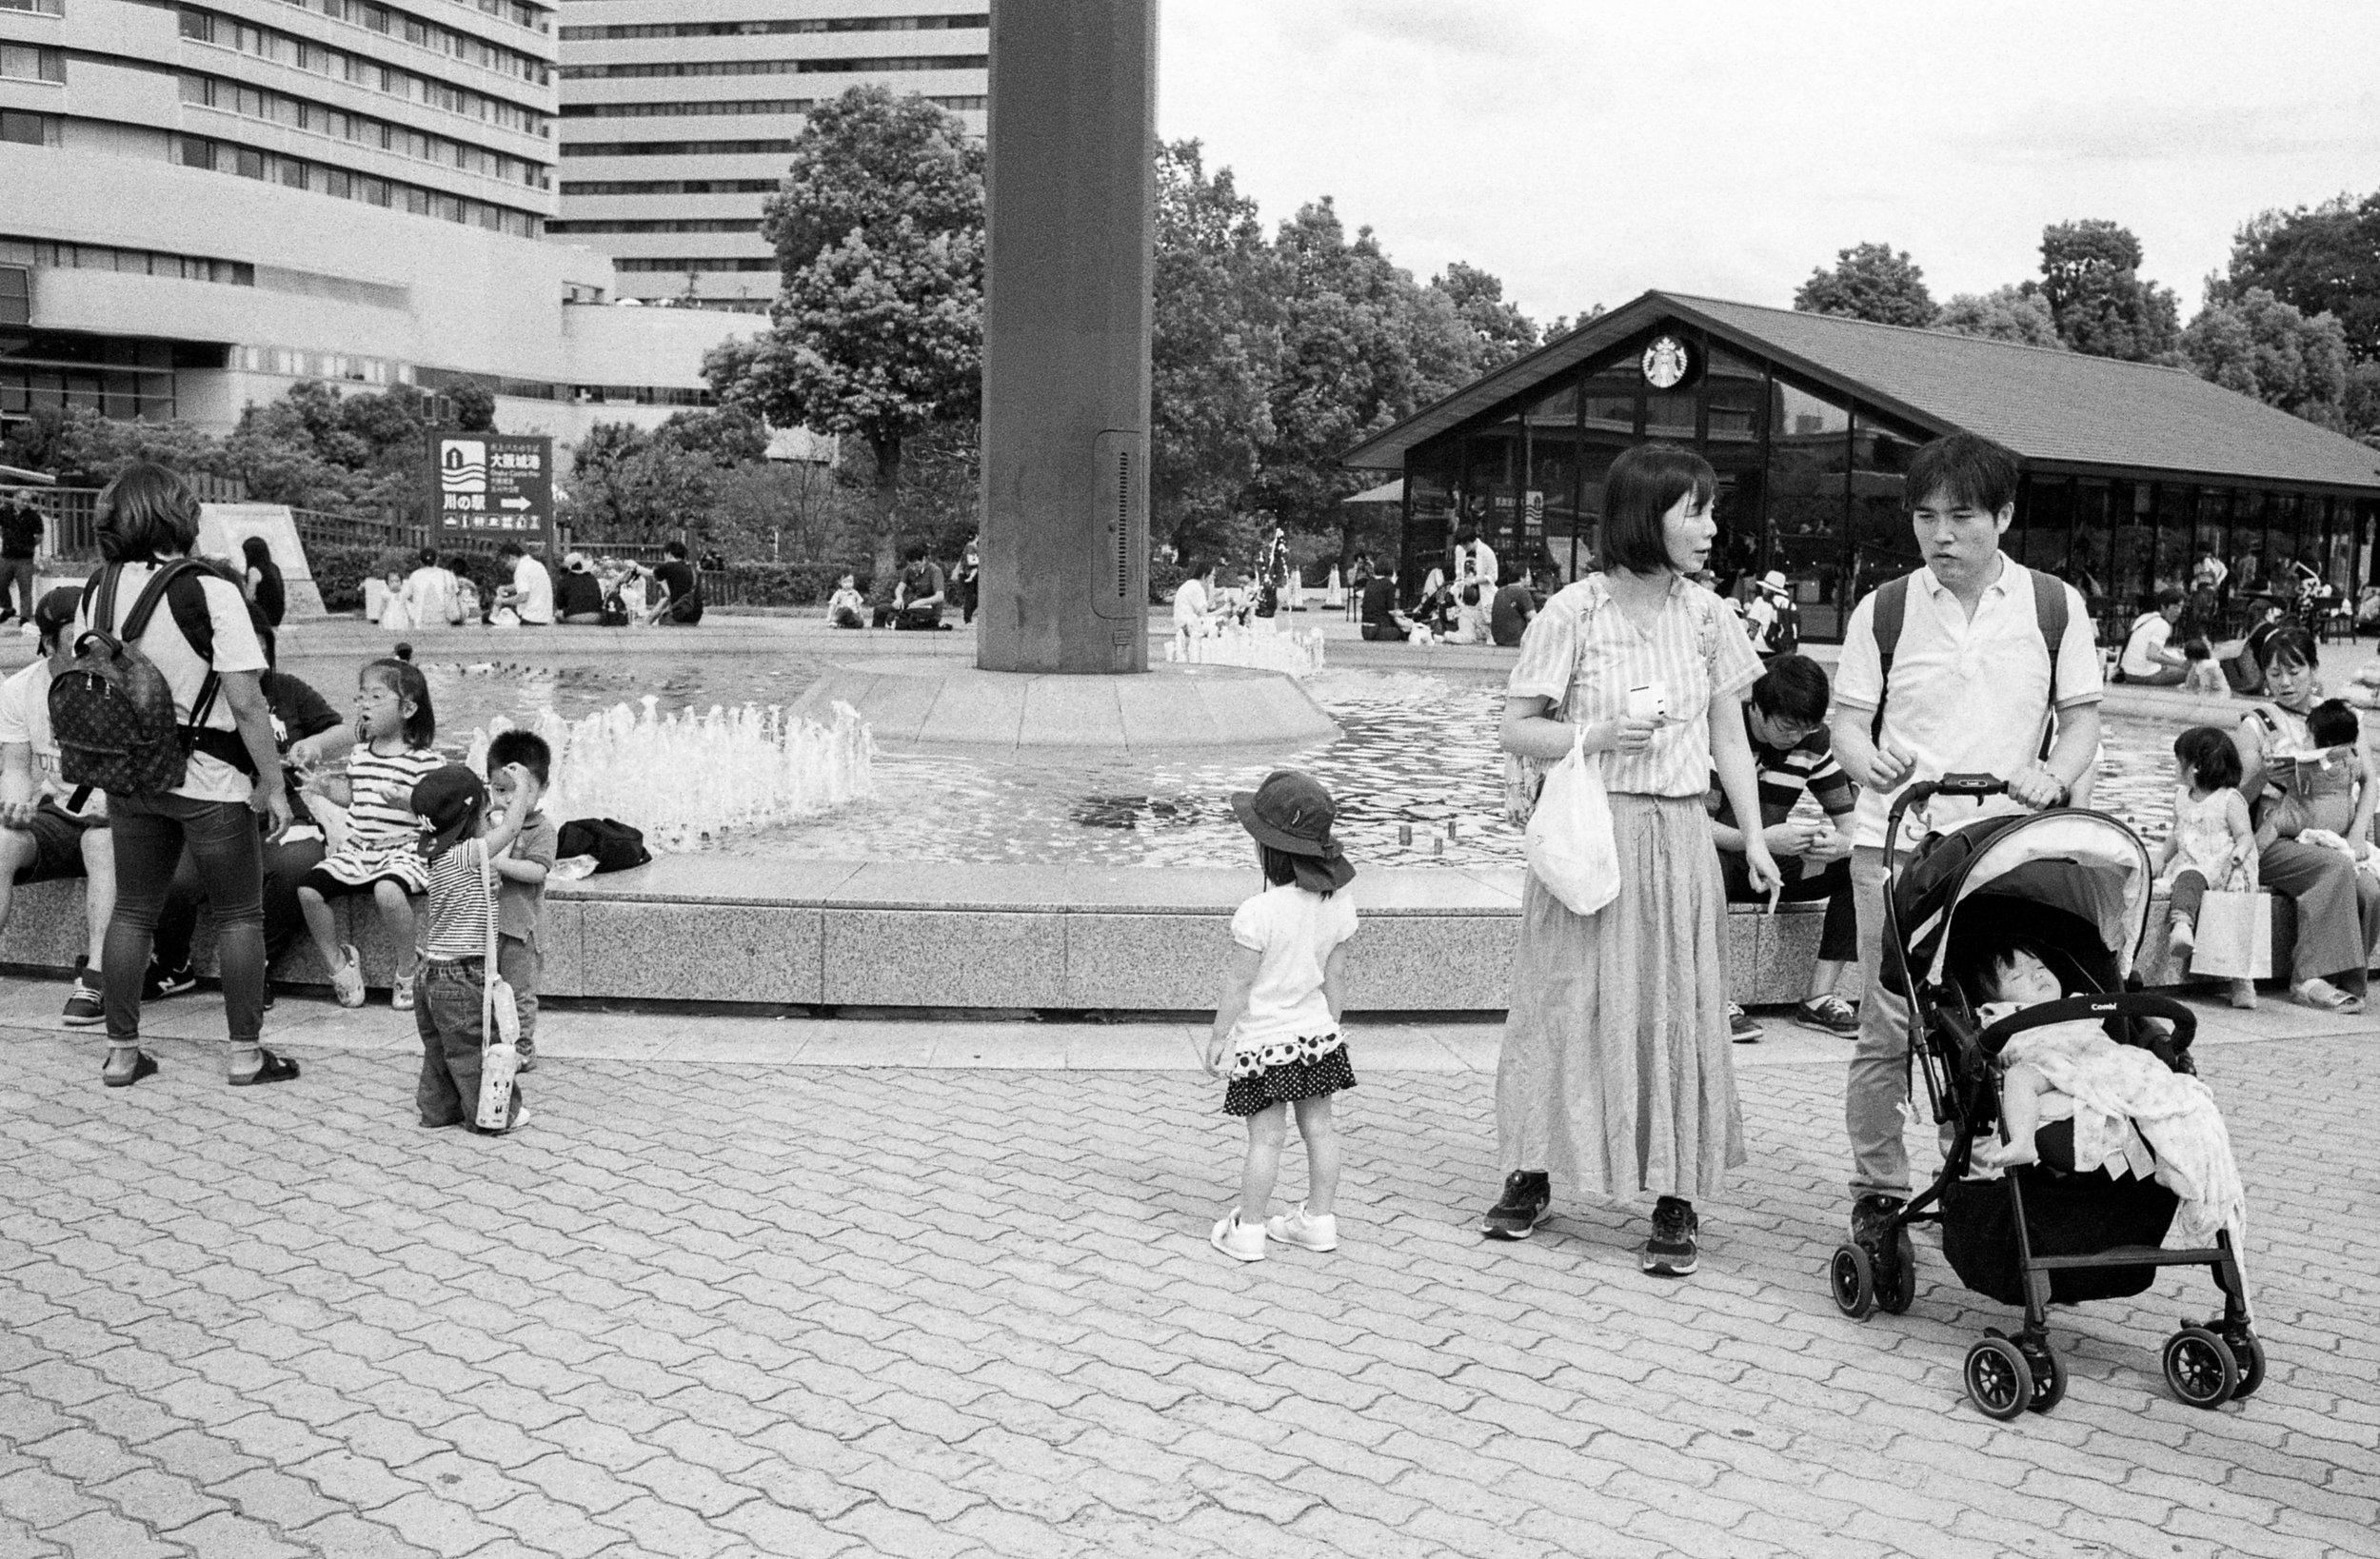 M6-TRIX400-800ISO-JAPANSUM18-OSAKALOOPLINE(Y)-OSAKAKOEN-023.jpg